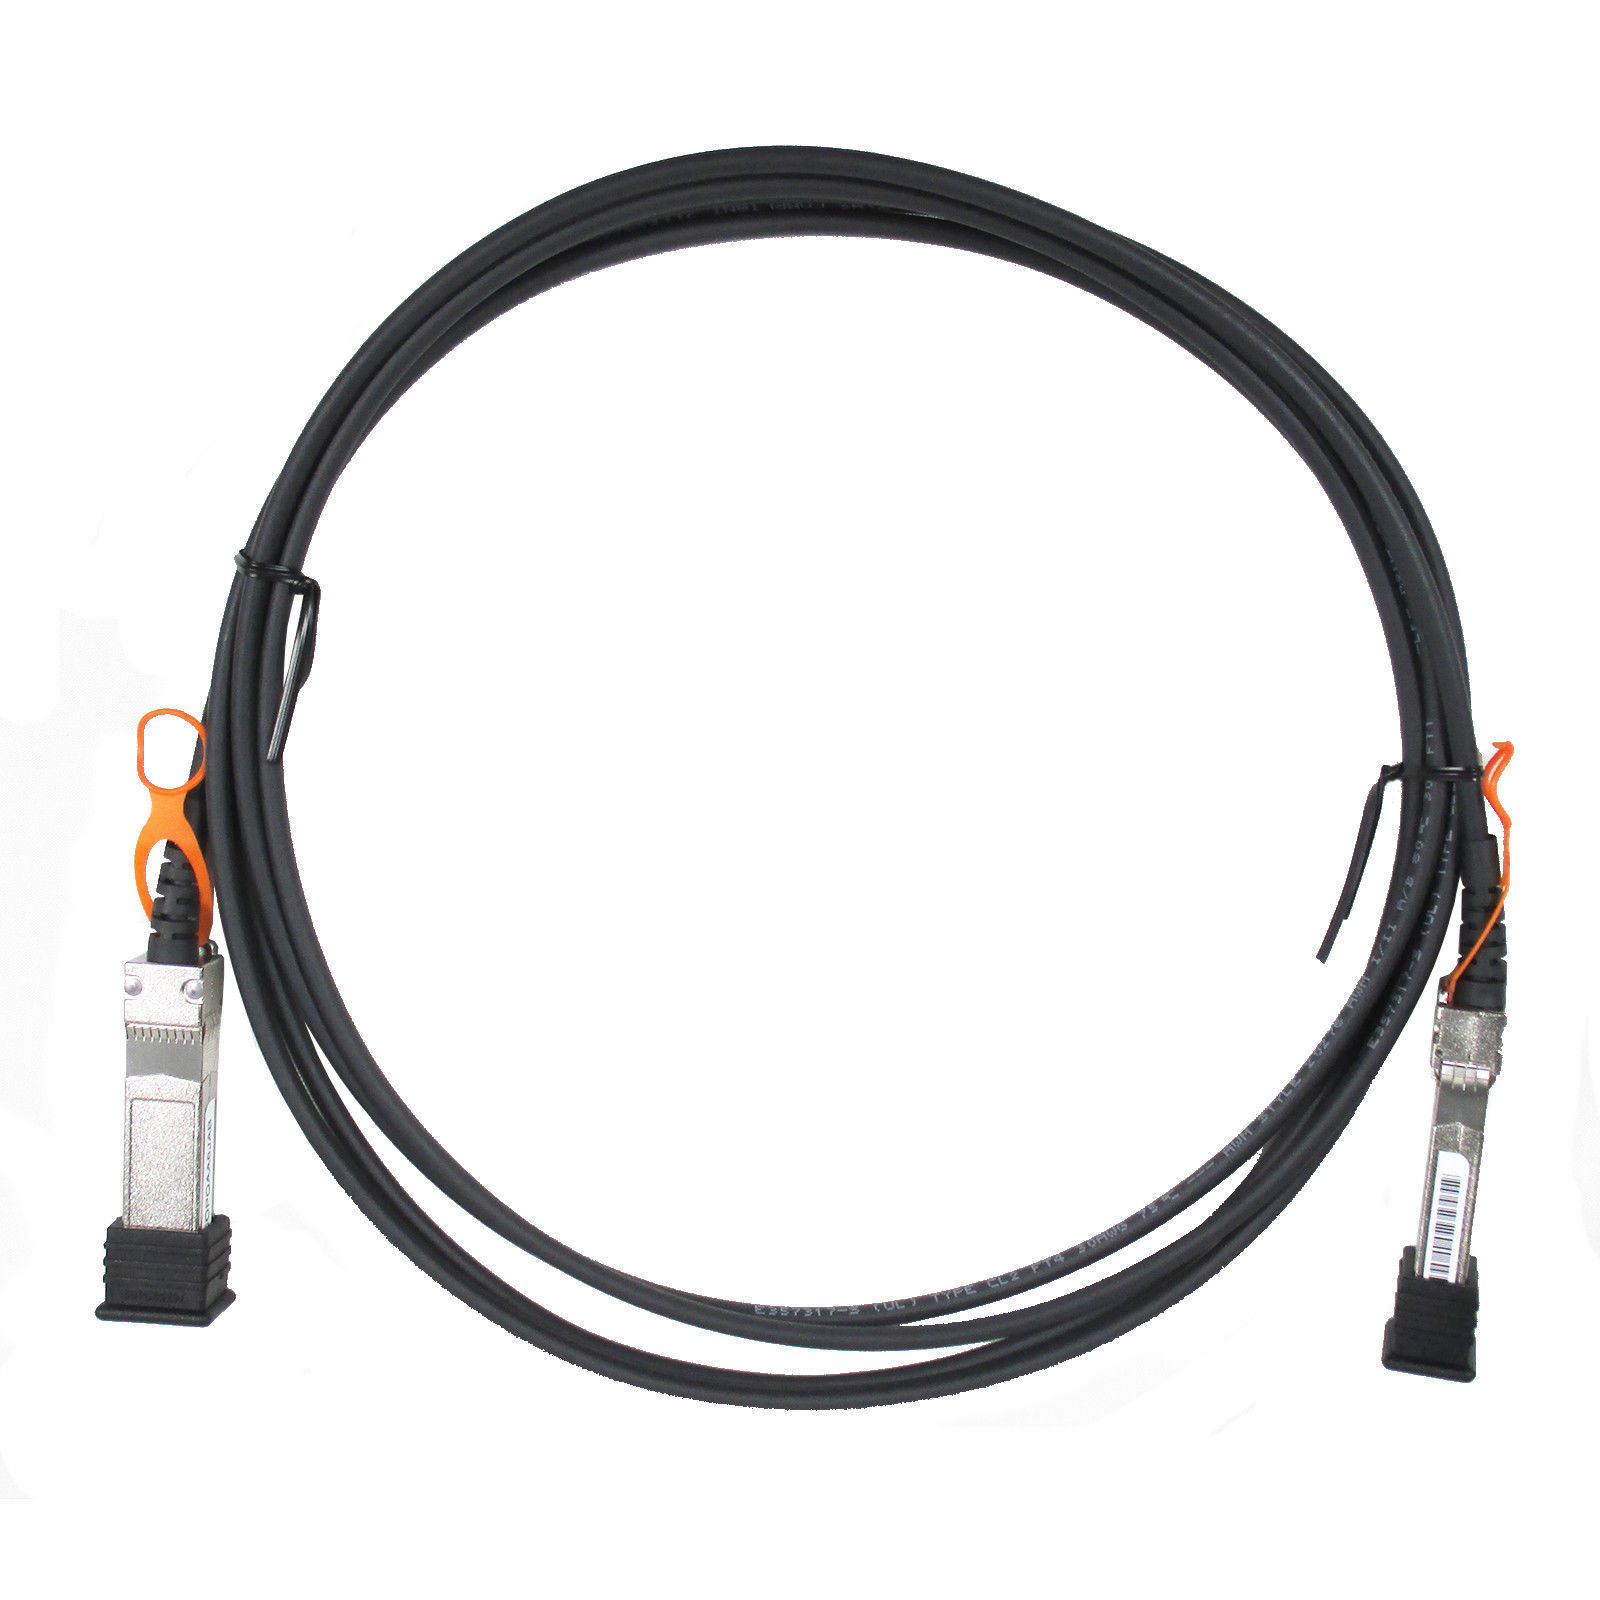 Cisco SFP-H10GB-CU3M Three 3 Meter 10GbE Twinax Cable 37-0961 COPQAA6J A